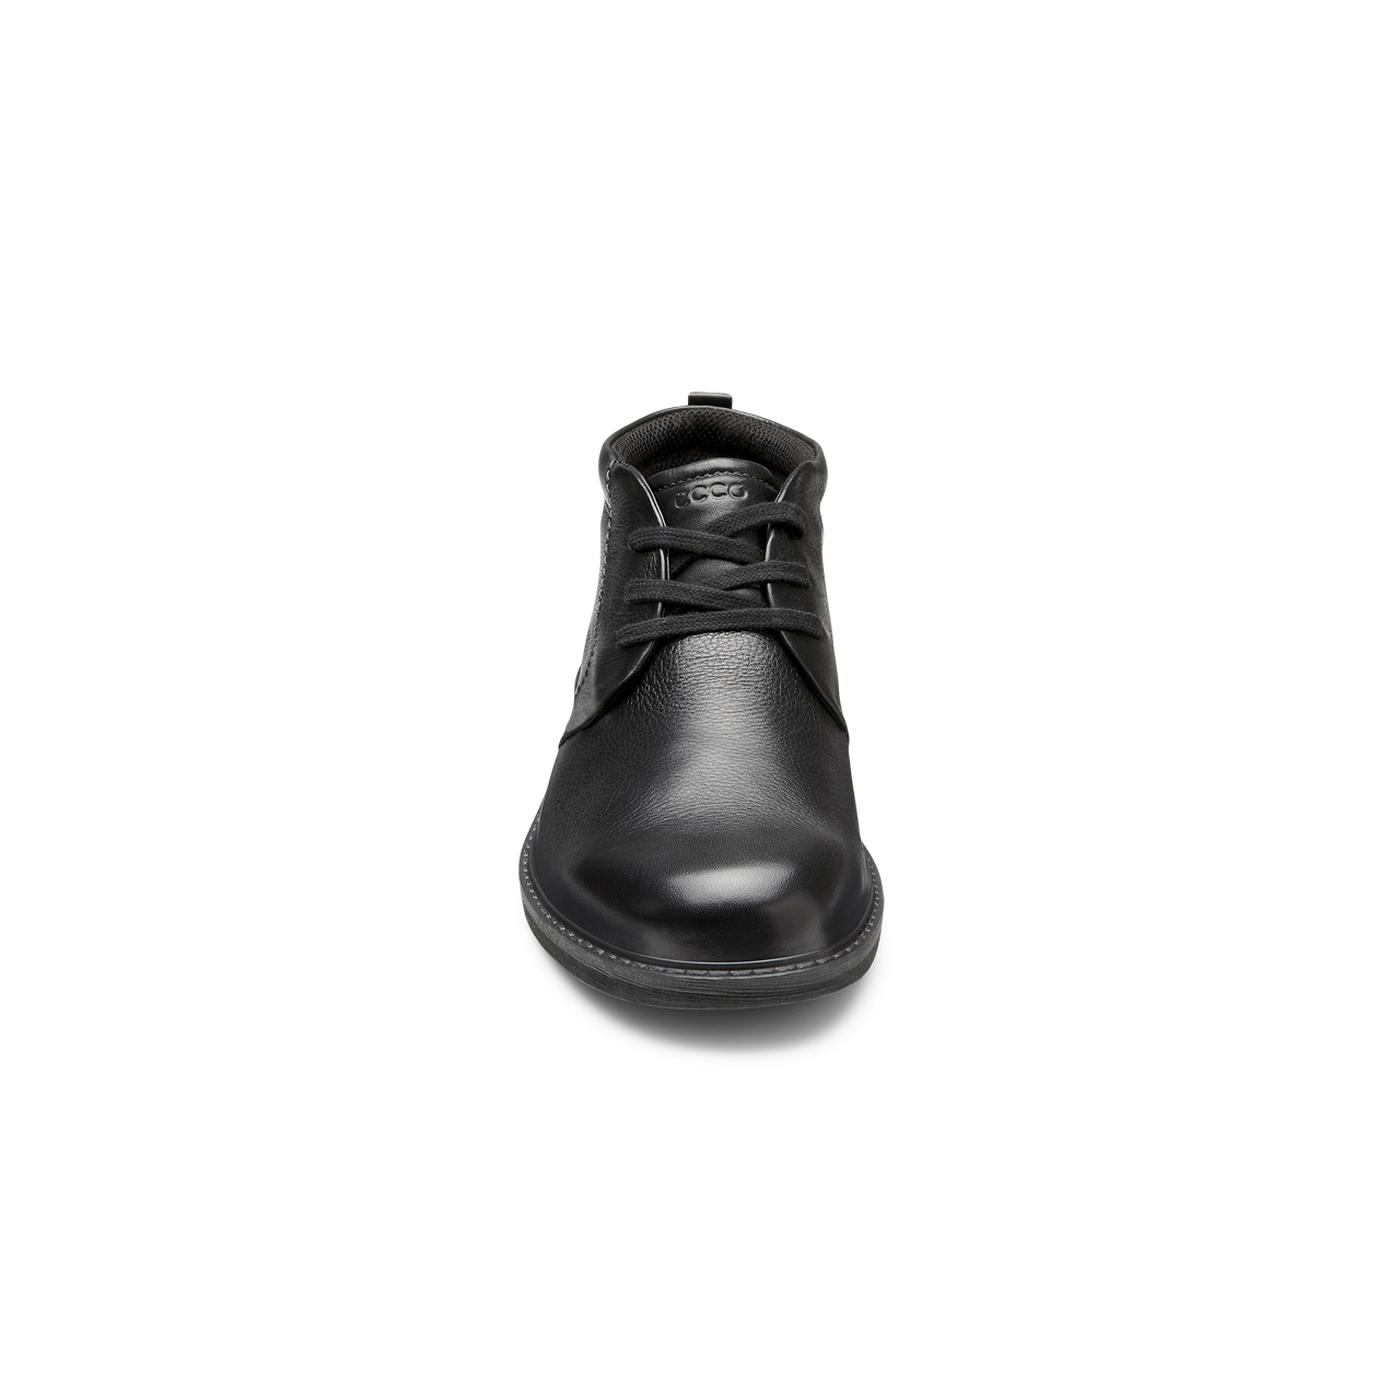 09c8547acf7c ECCO Turn GTX Boot